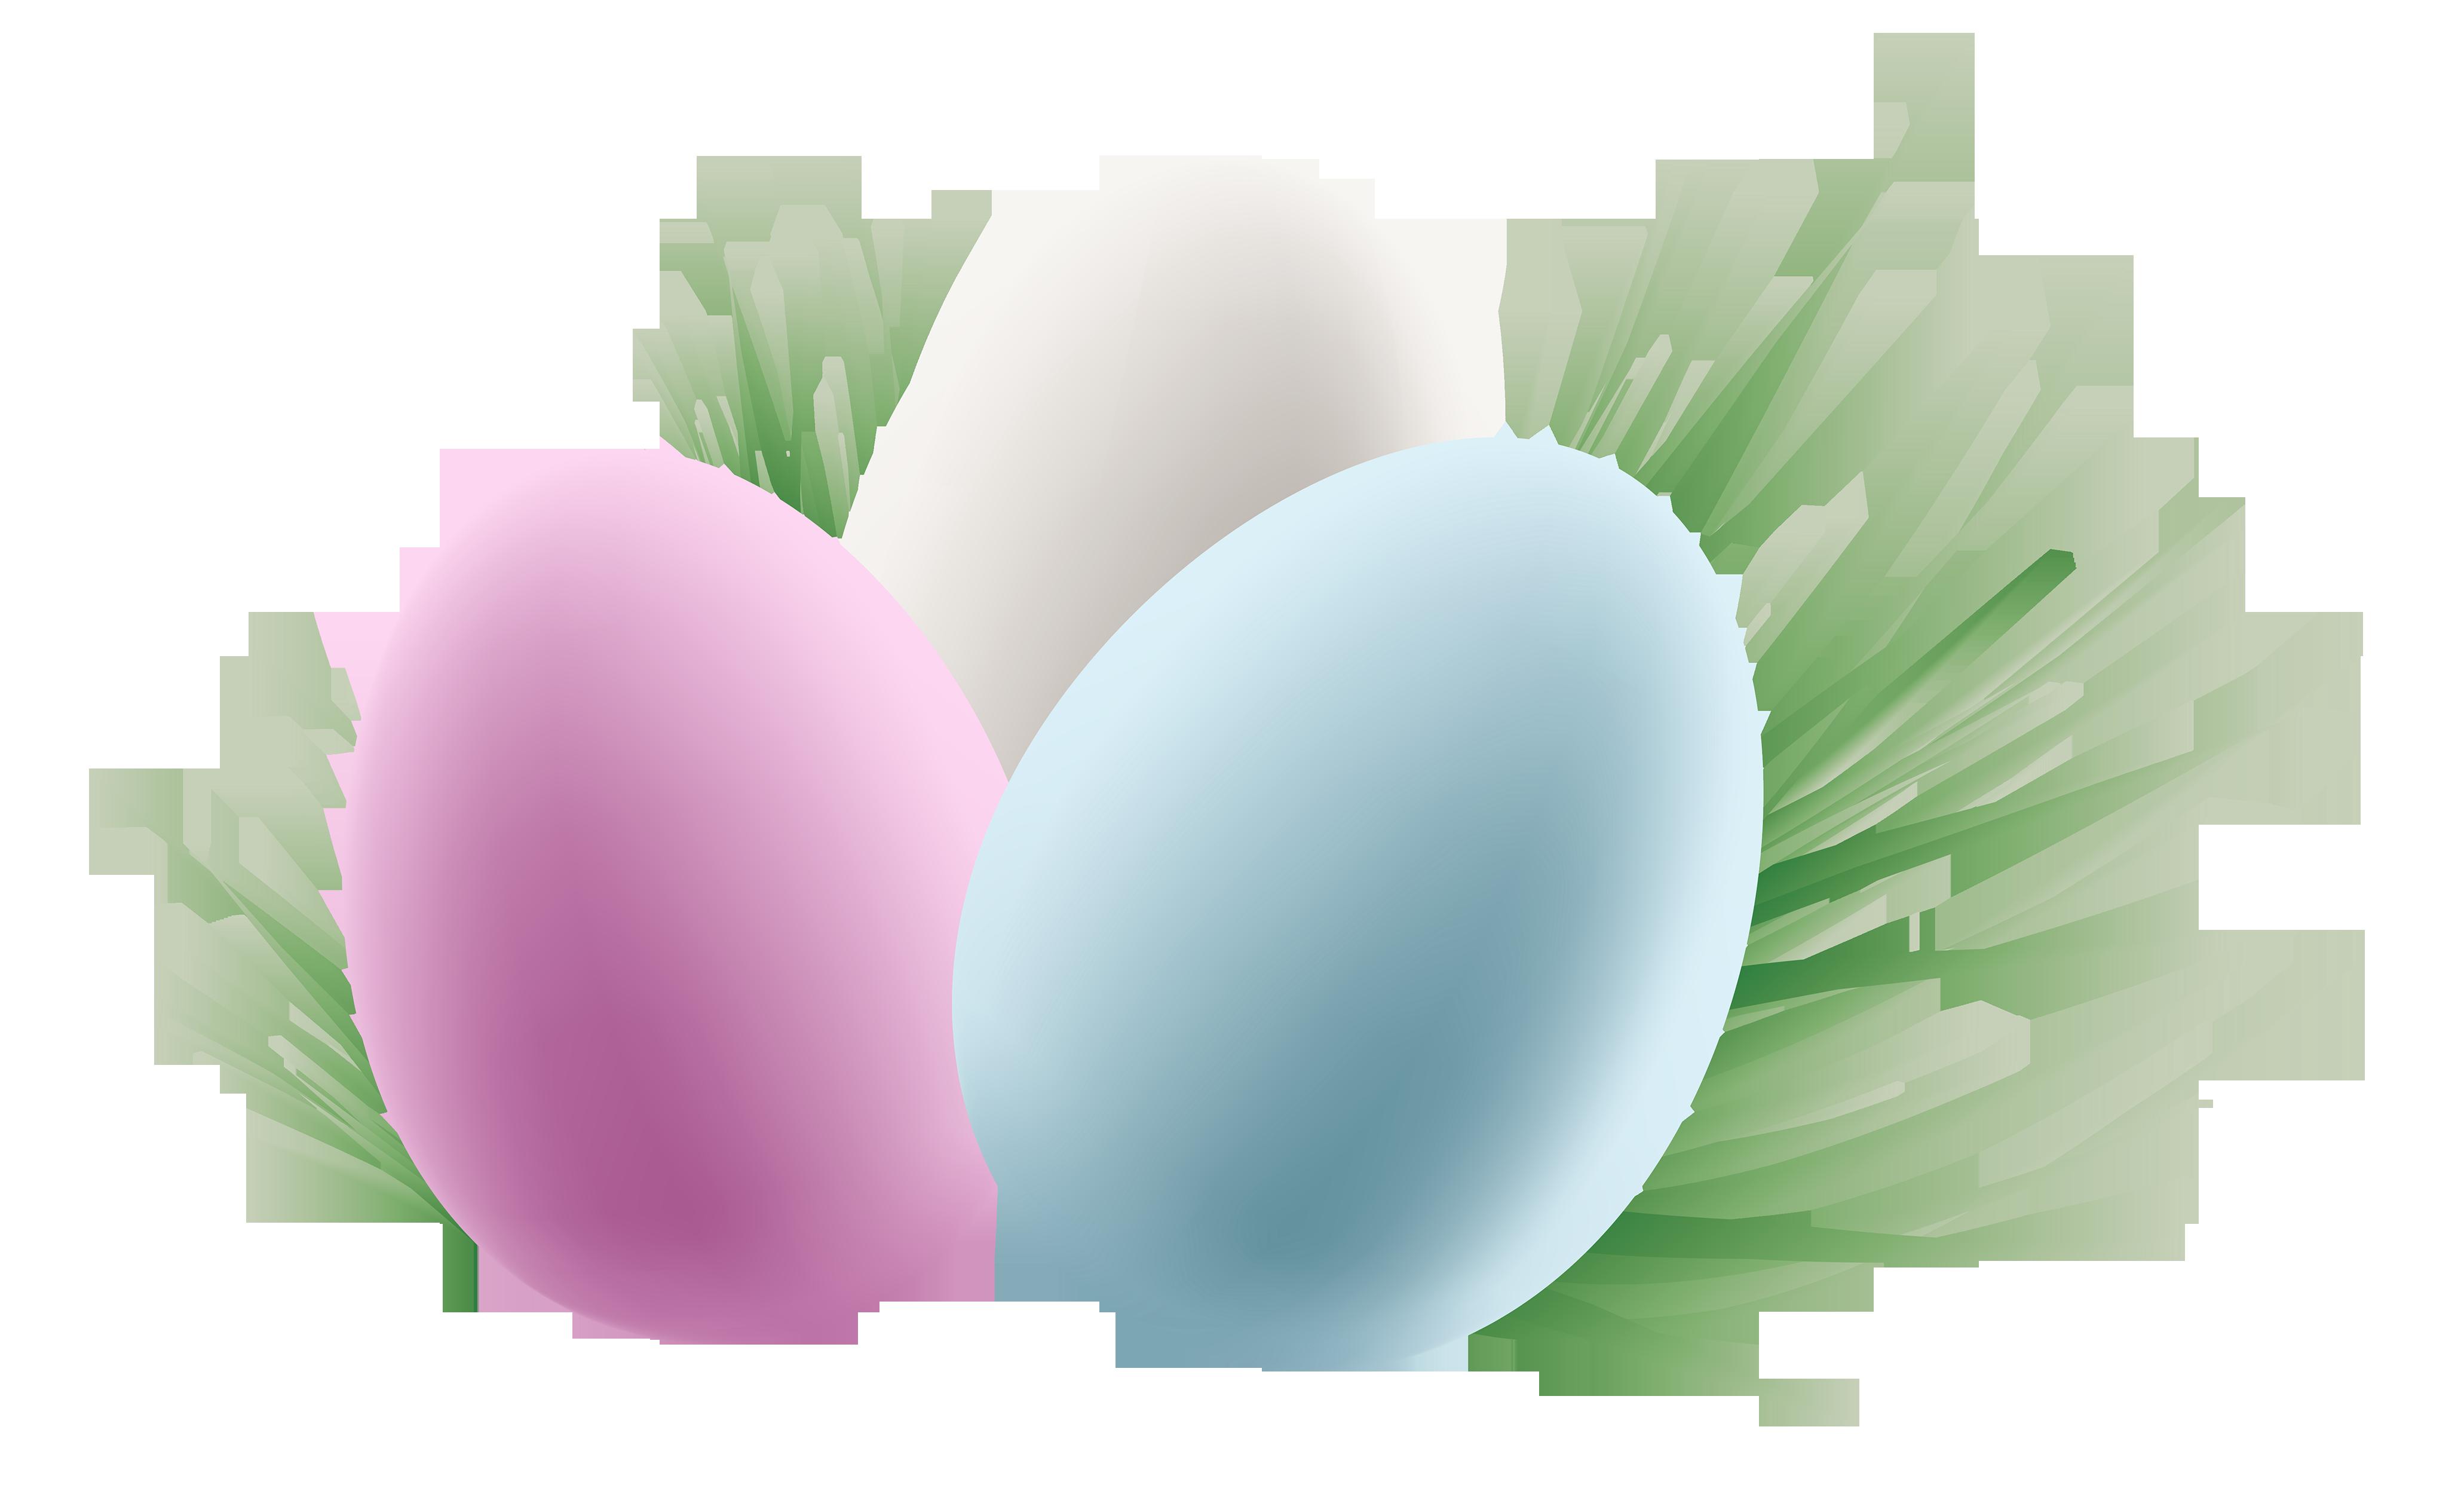 Free Easter Egg Transparent Background, Download Free Clip Art, Free.